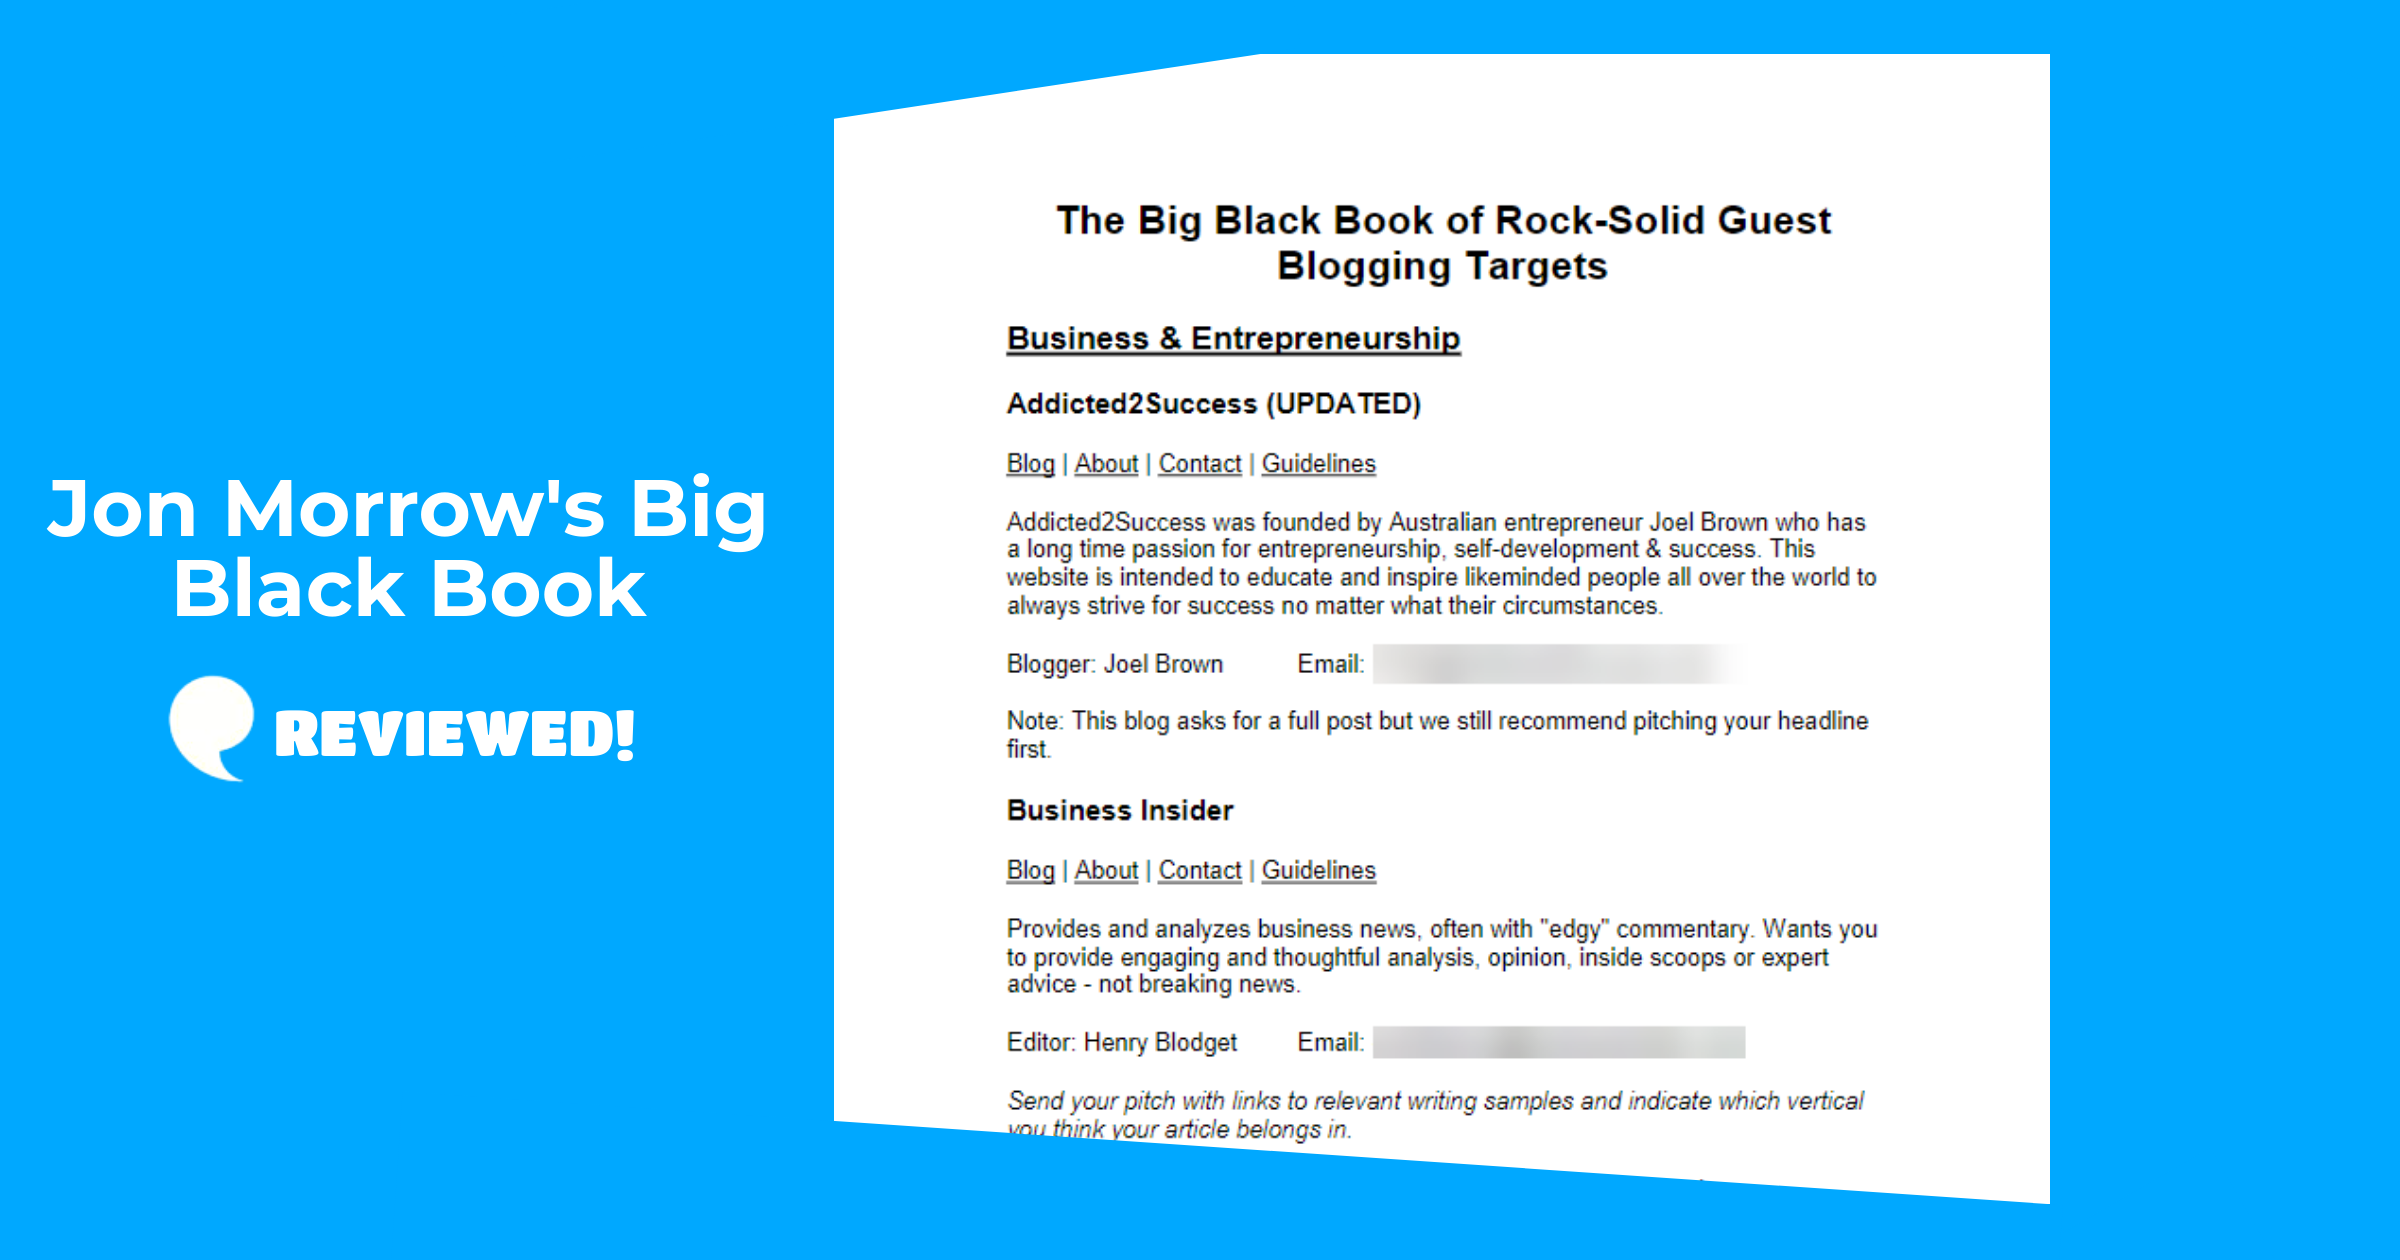 jon morrows big balck book reviewed by my internet quest